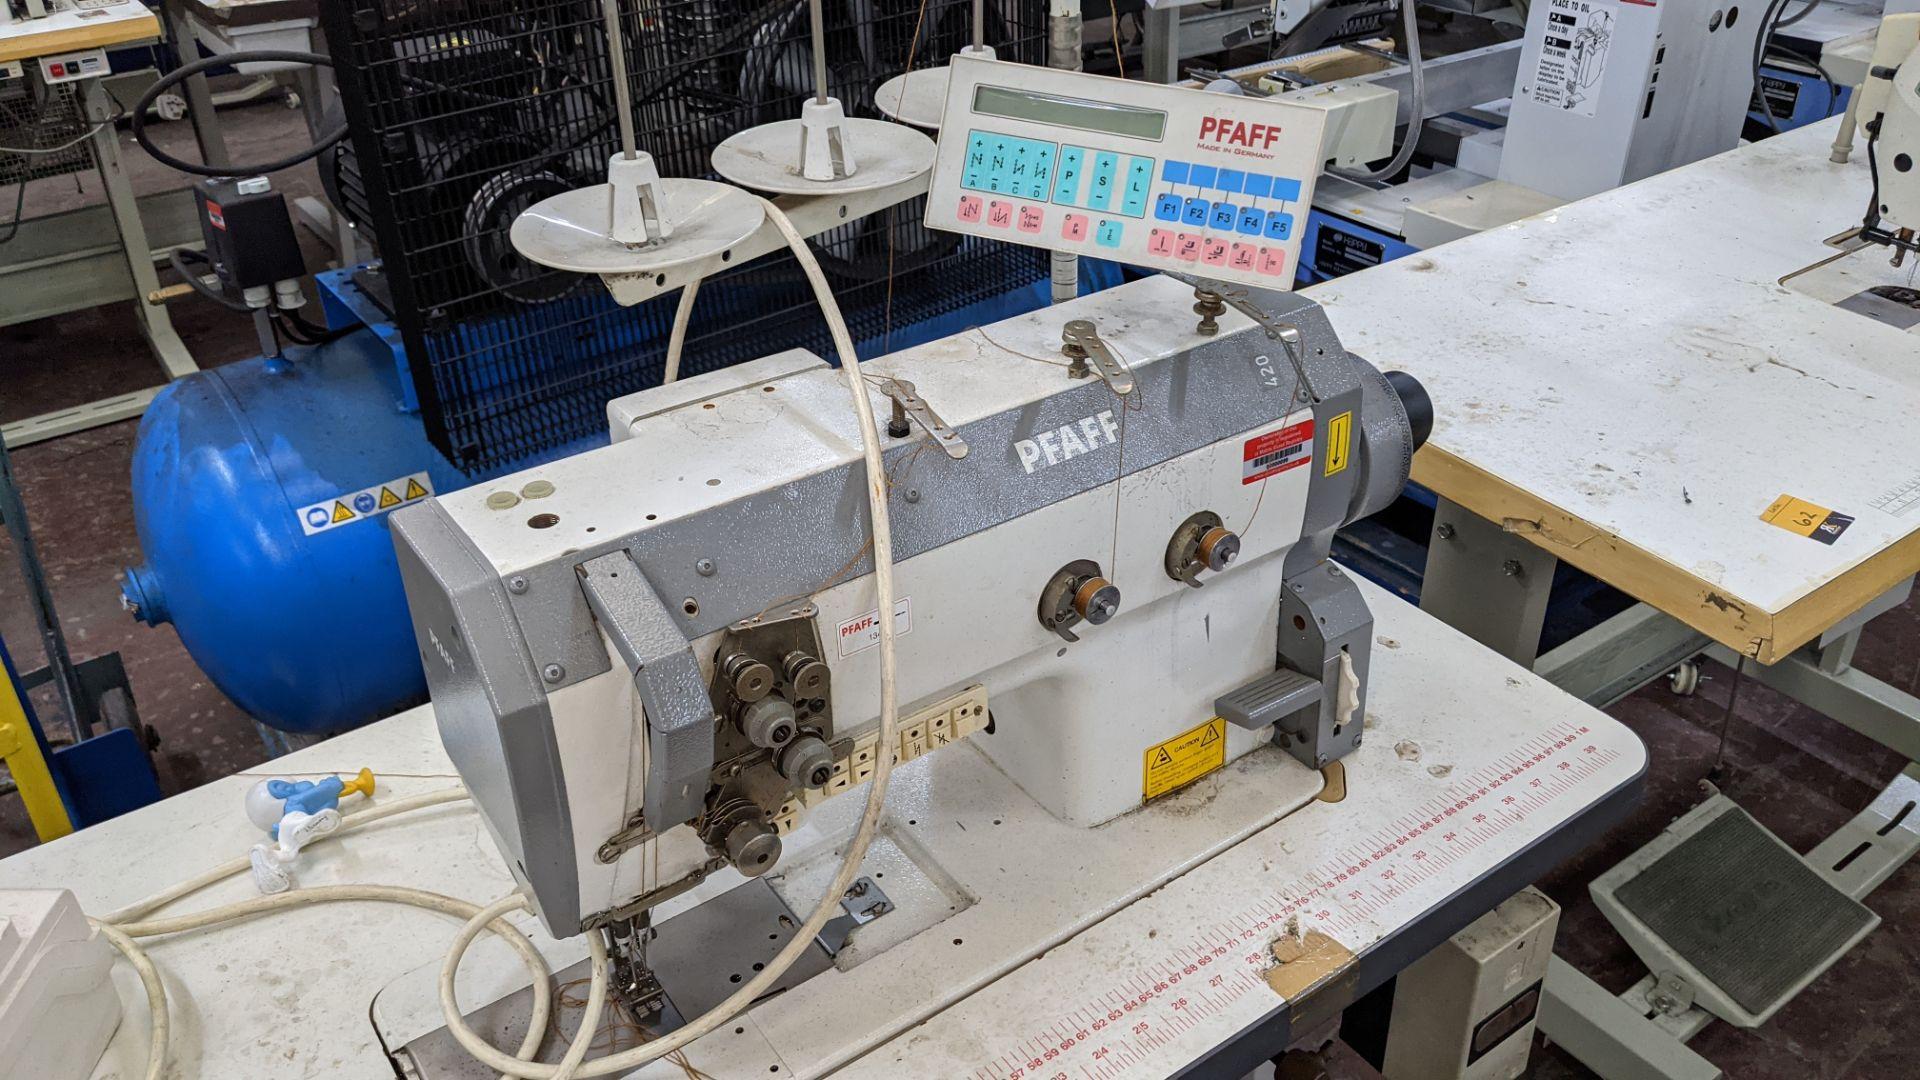 Pfaff twin needle sewing machine, model 422 - Image 7 of 17